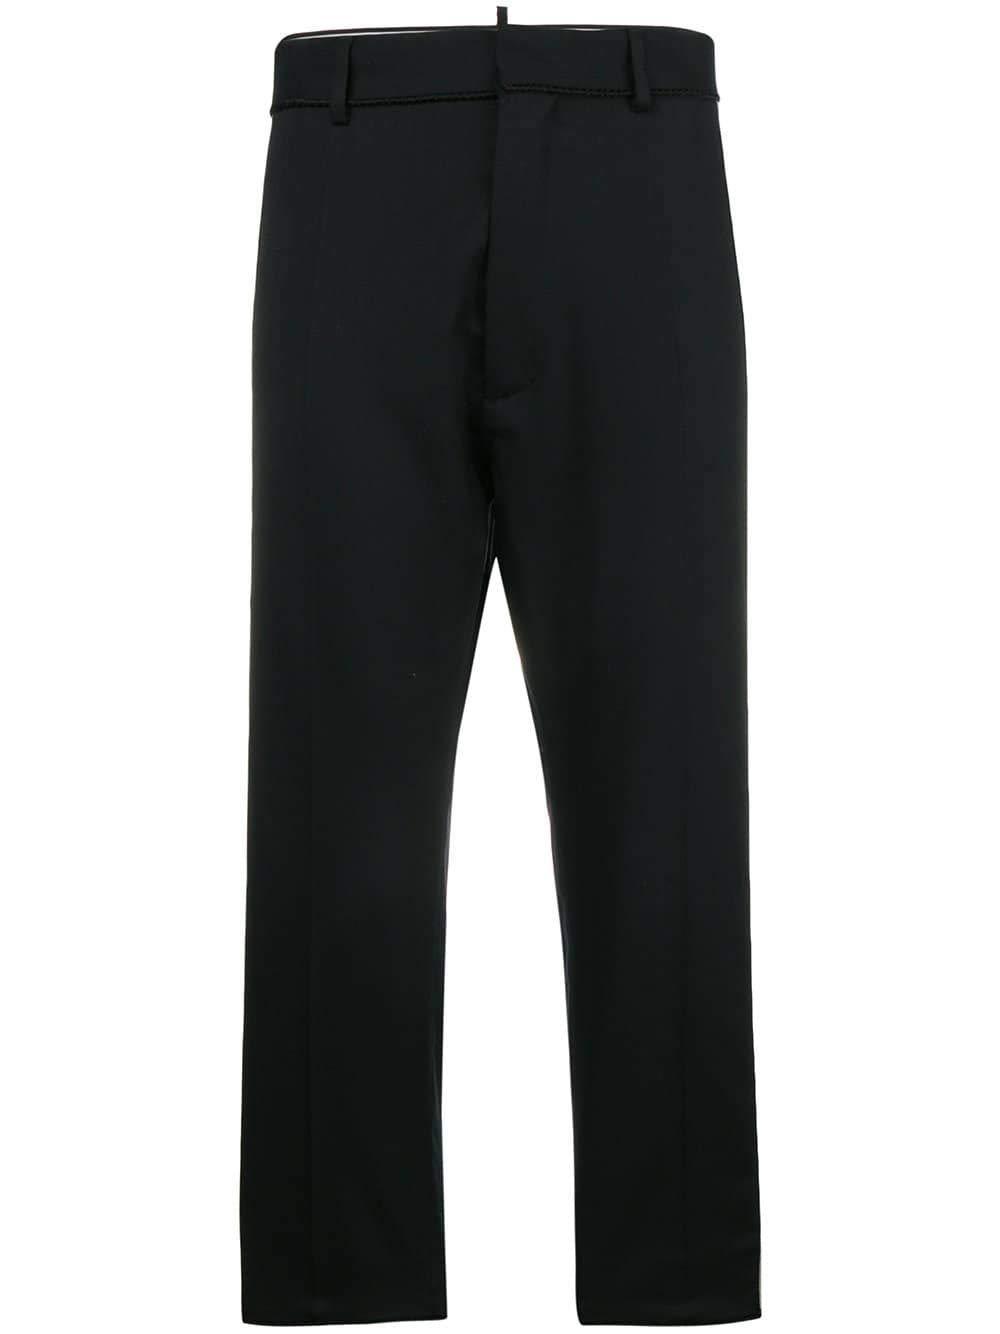 Brand Size 44 DSQUARED2 Women's S72KA0845S42916900 Black Wool Pants